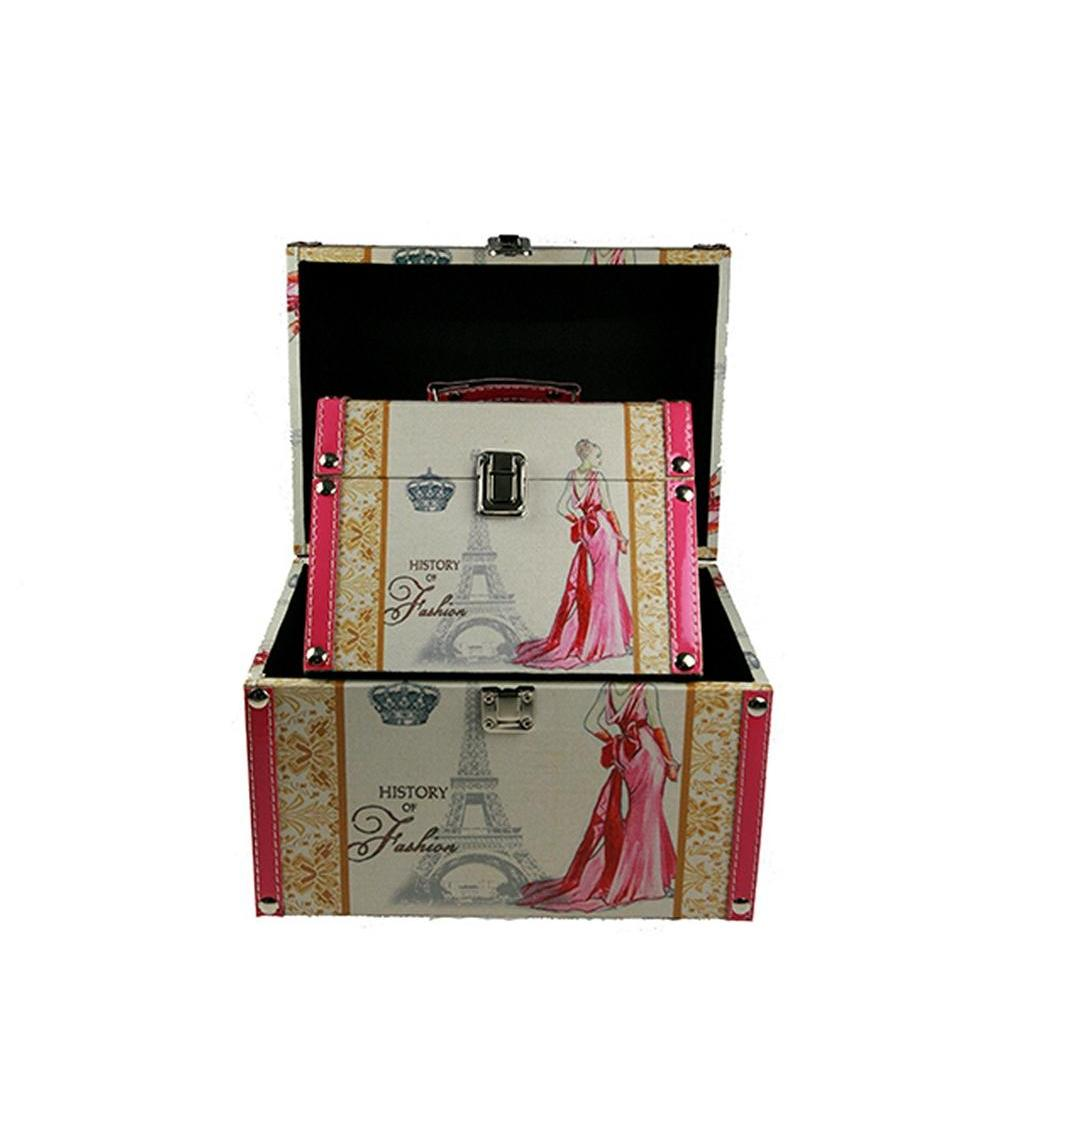 Набор сундучков Roura Decoracion, 2 шт. 34789 набор сундучков из 2 х шт 28 17 11см уп 1 8наб